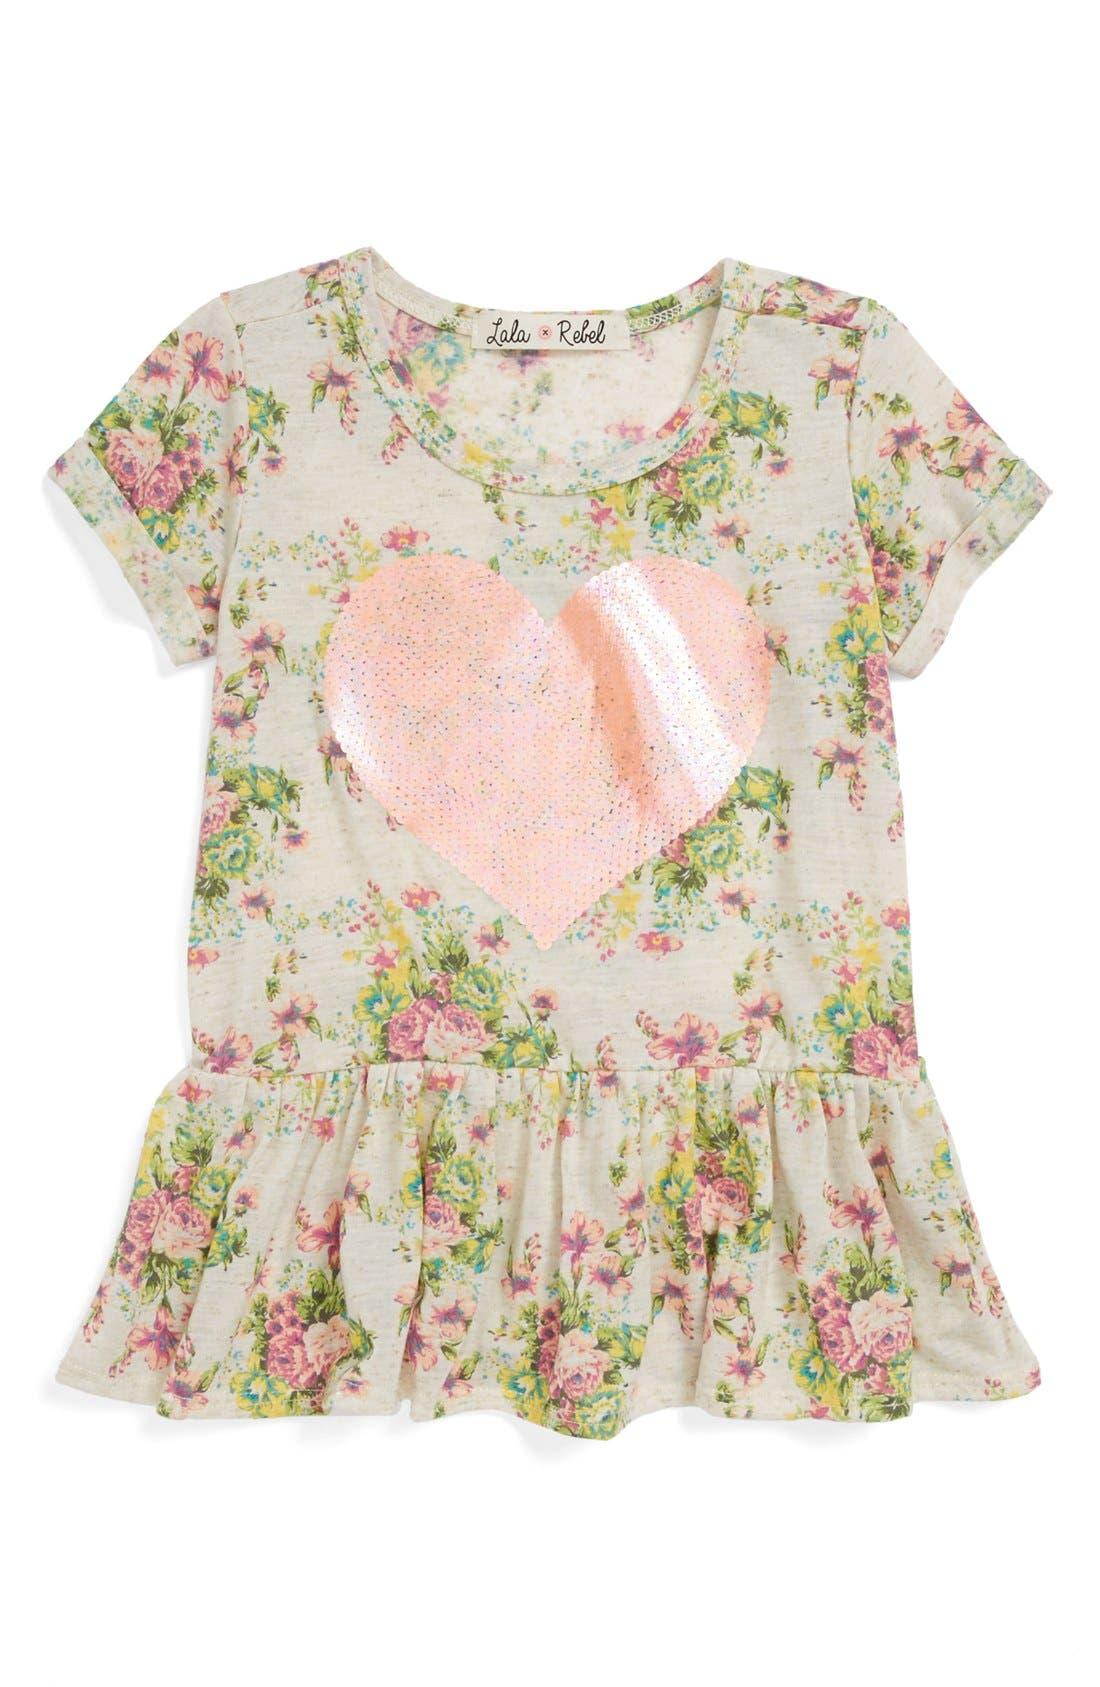 Main Image - Lala Rebel Sequin Print Peplum Top (Toddler Girls)